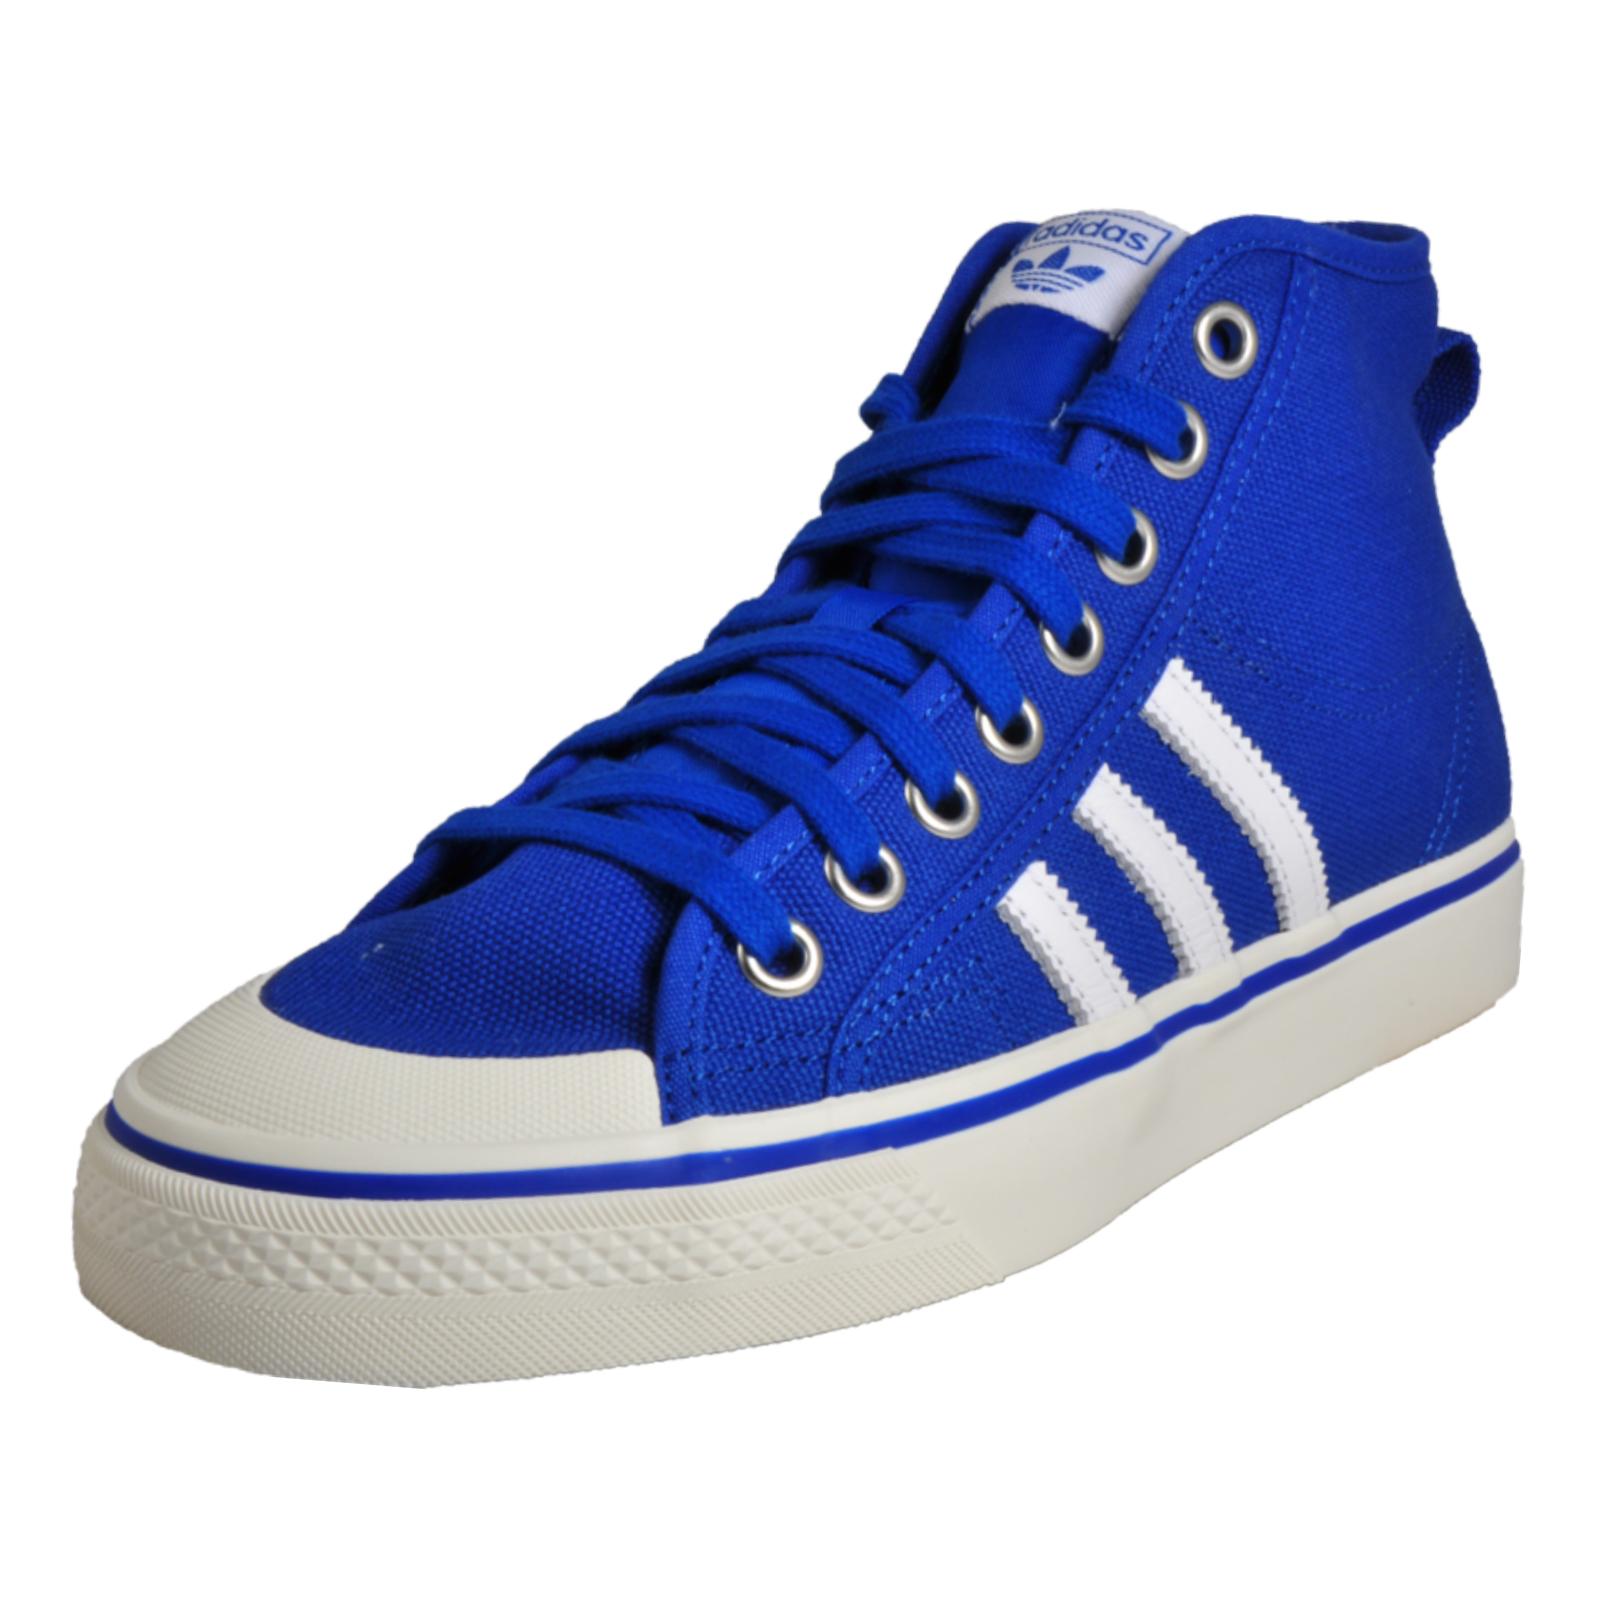 f9dbd8c34ec8 Details zu Adidas Originals Nizza Hi Mens Vintage Retro Sneakers Trainers  Blue